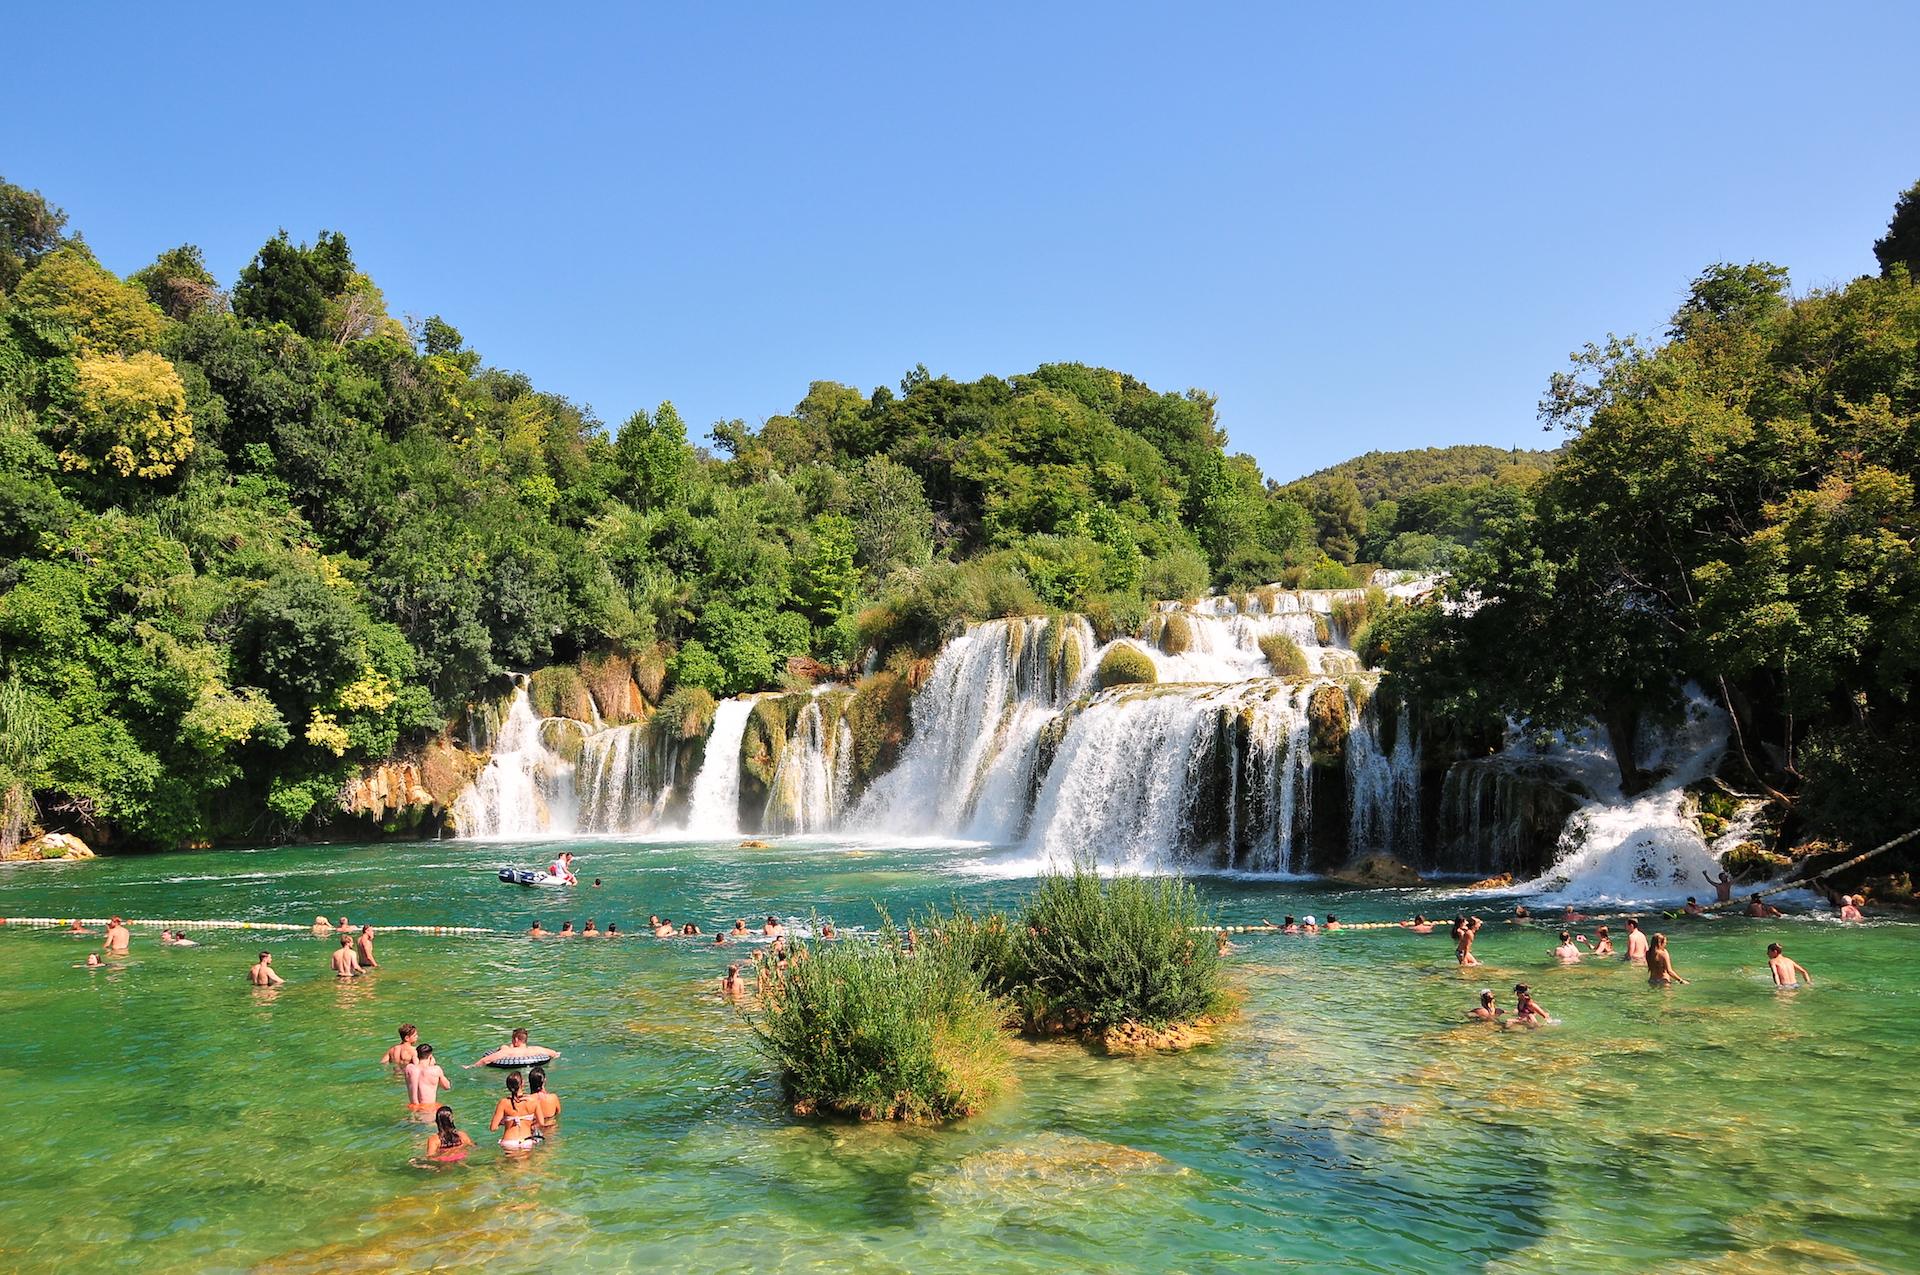 Road Trip En Croatie De Split A Dubrovnik Itineraire Adresses